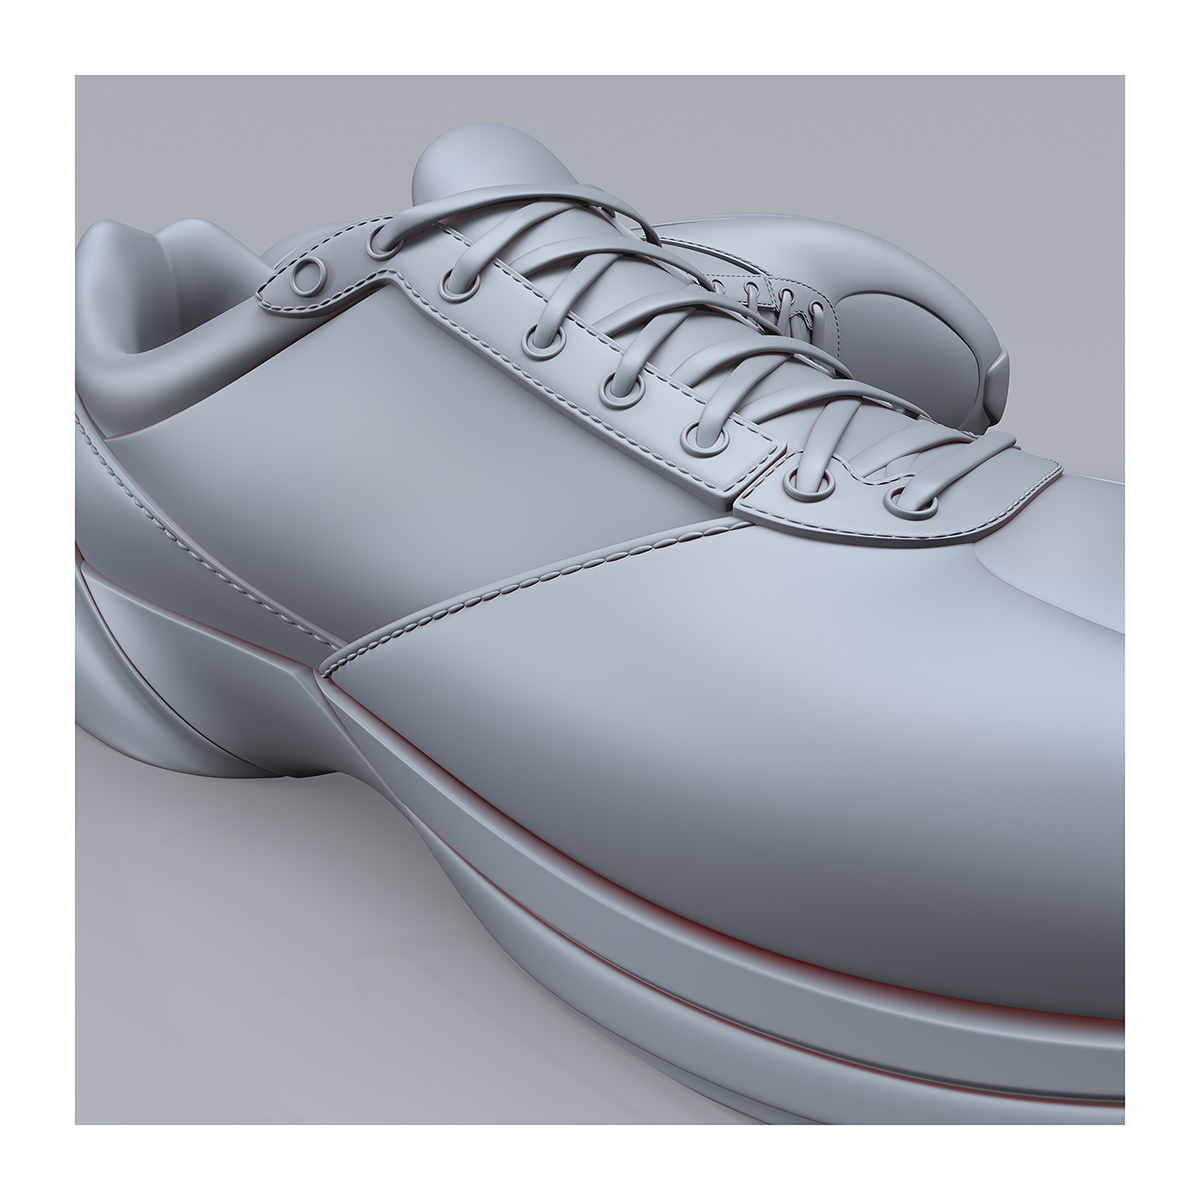 Still Life 11 001 1 - 2020 - Still Life N°11. (Shoes. Sneakers)